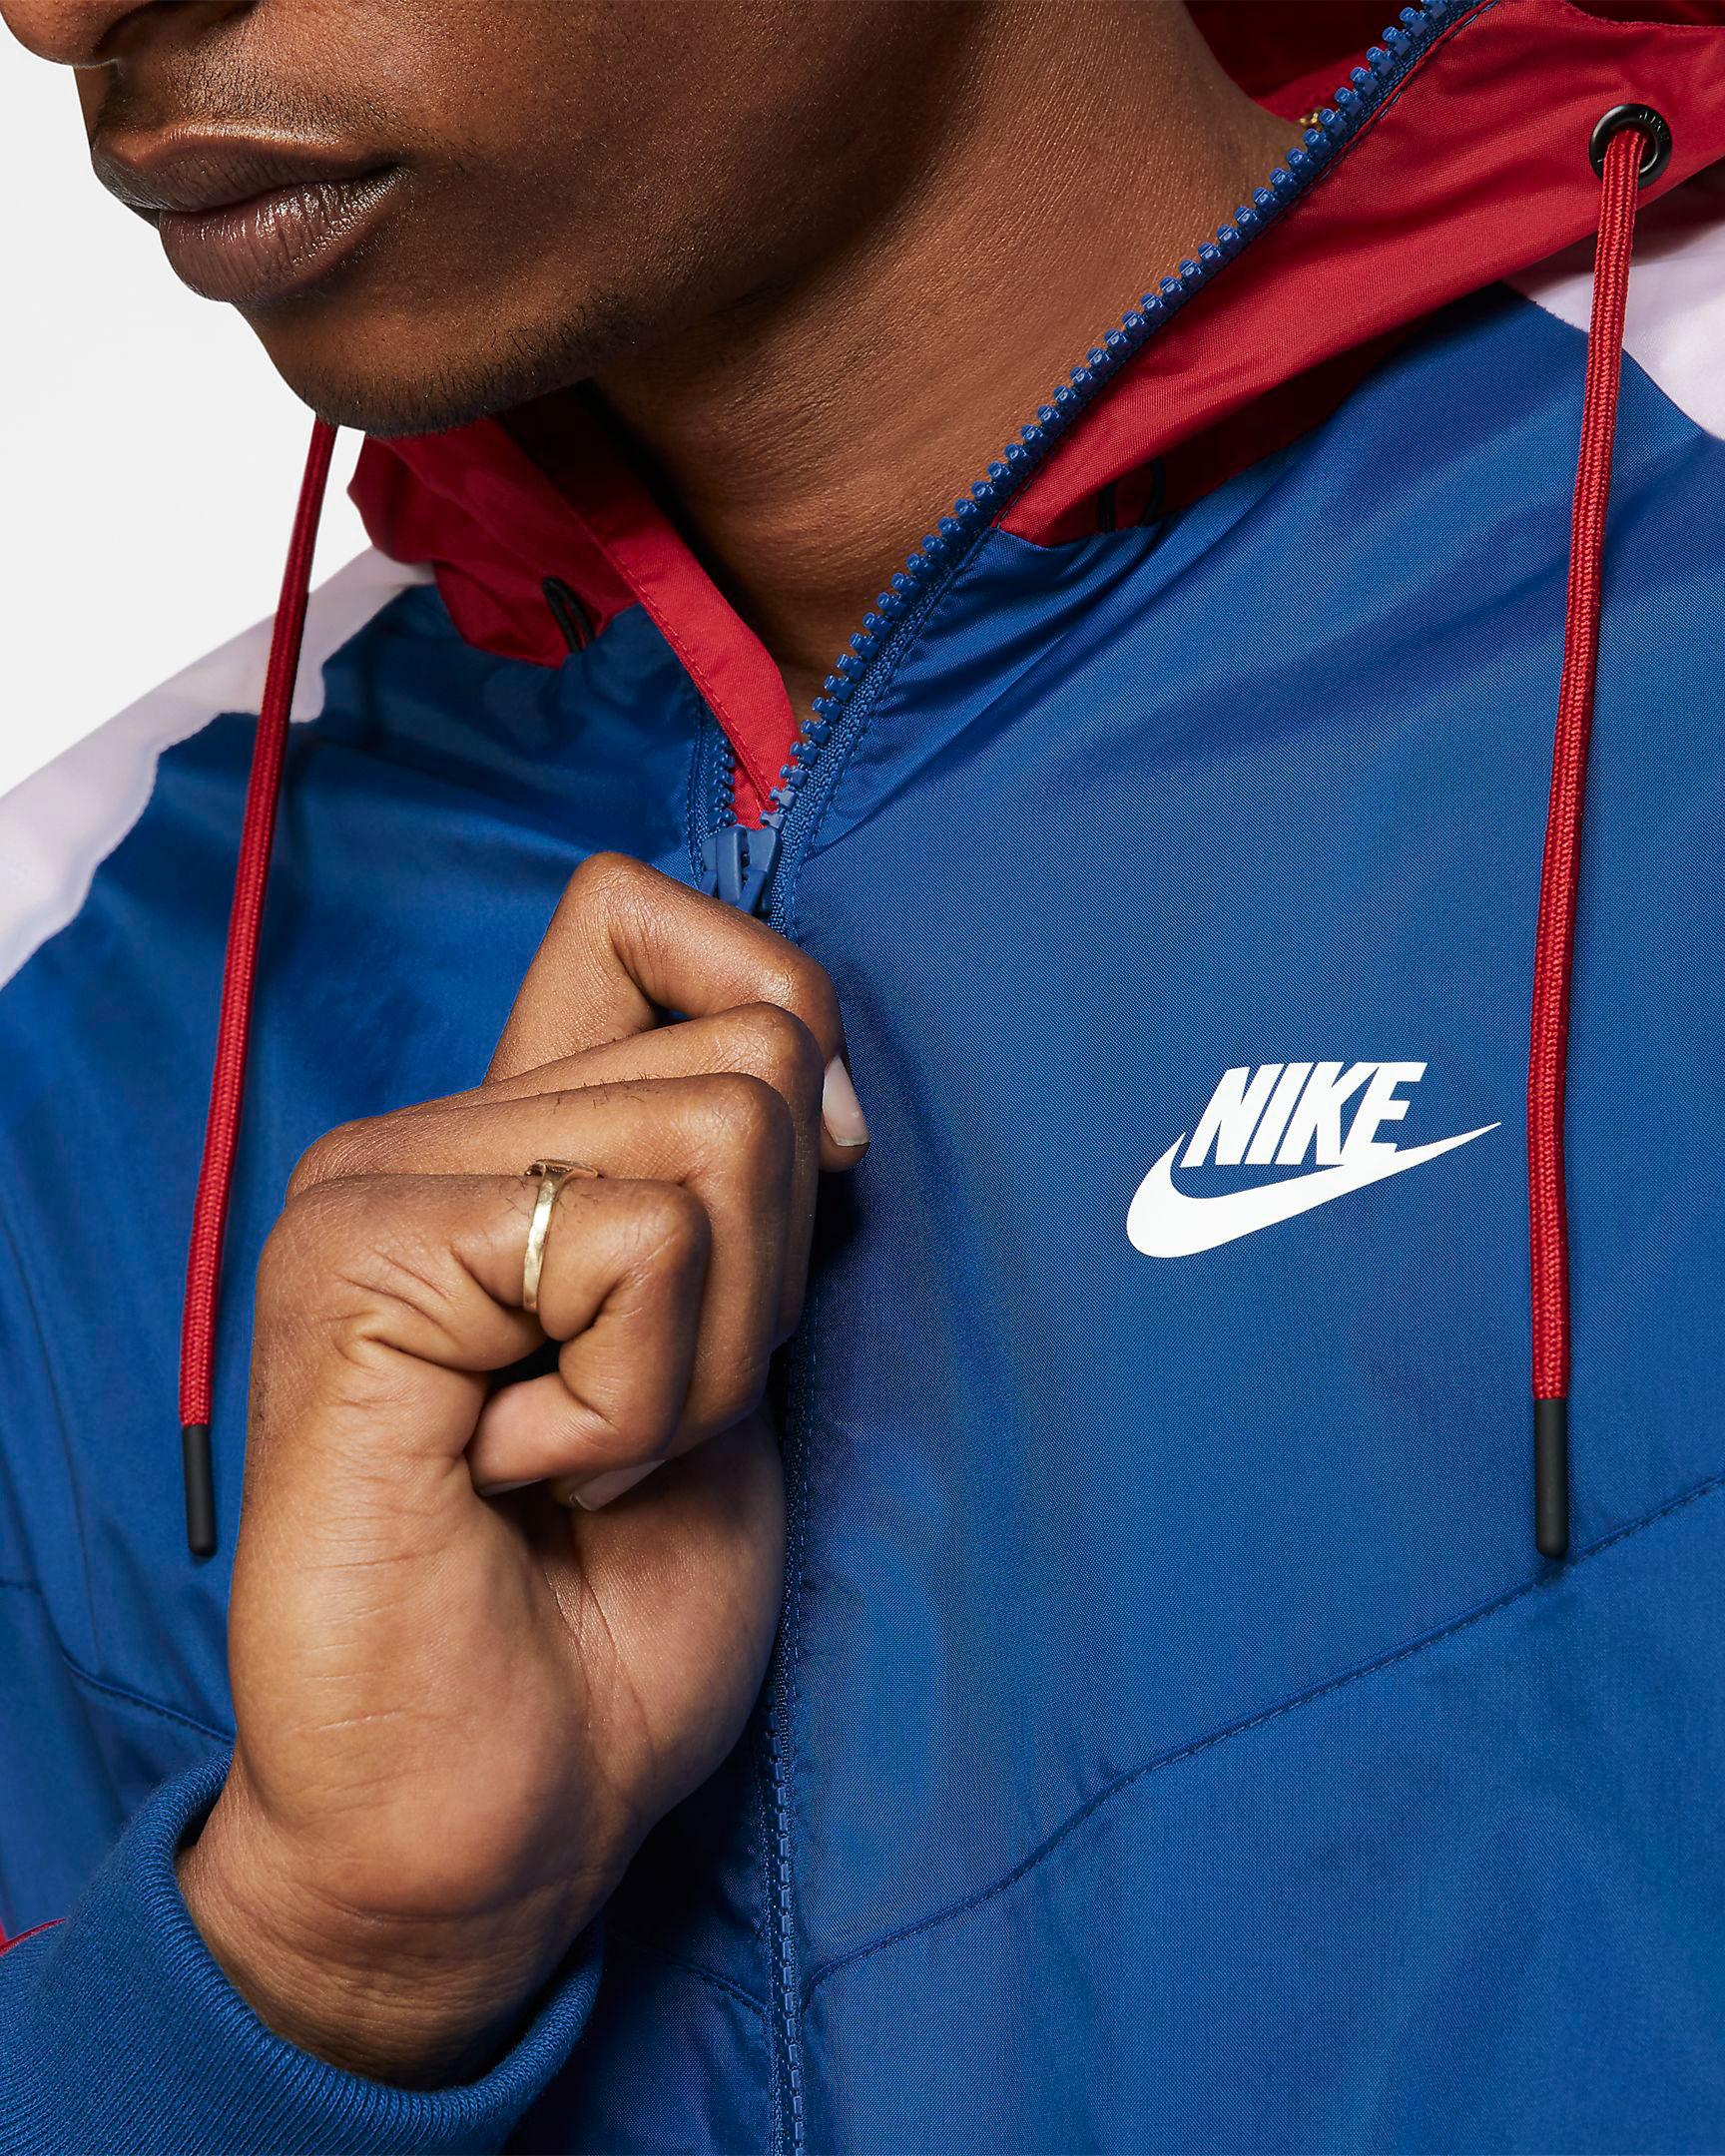 nike-americana-red-white-blue-windrunner-jacket-3